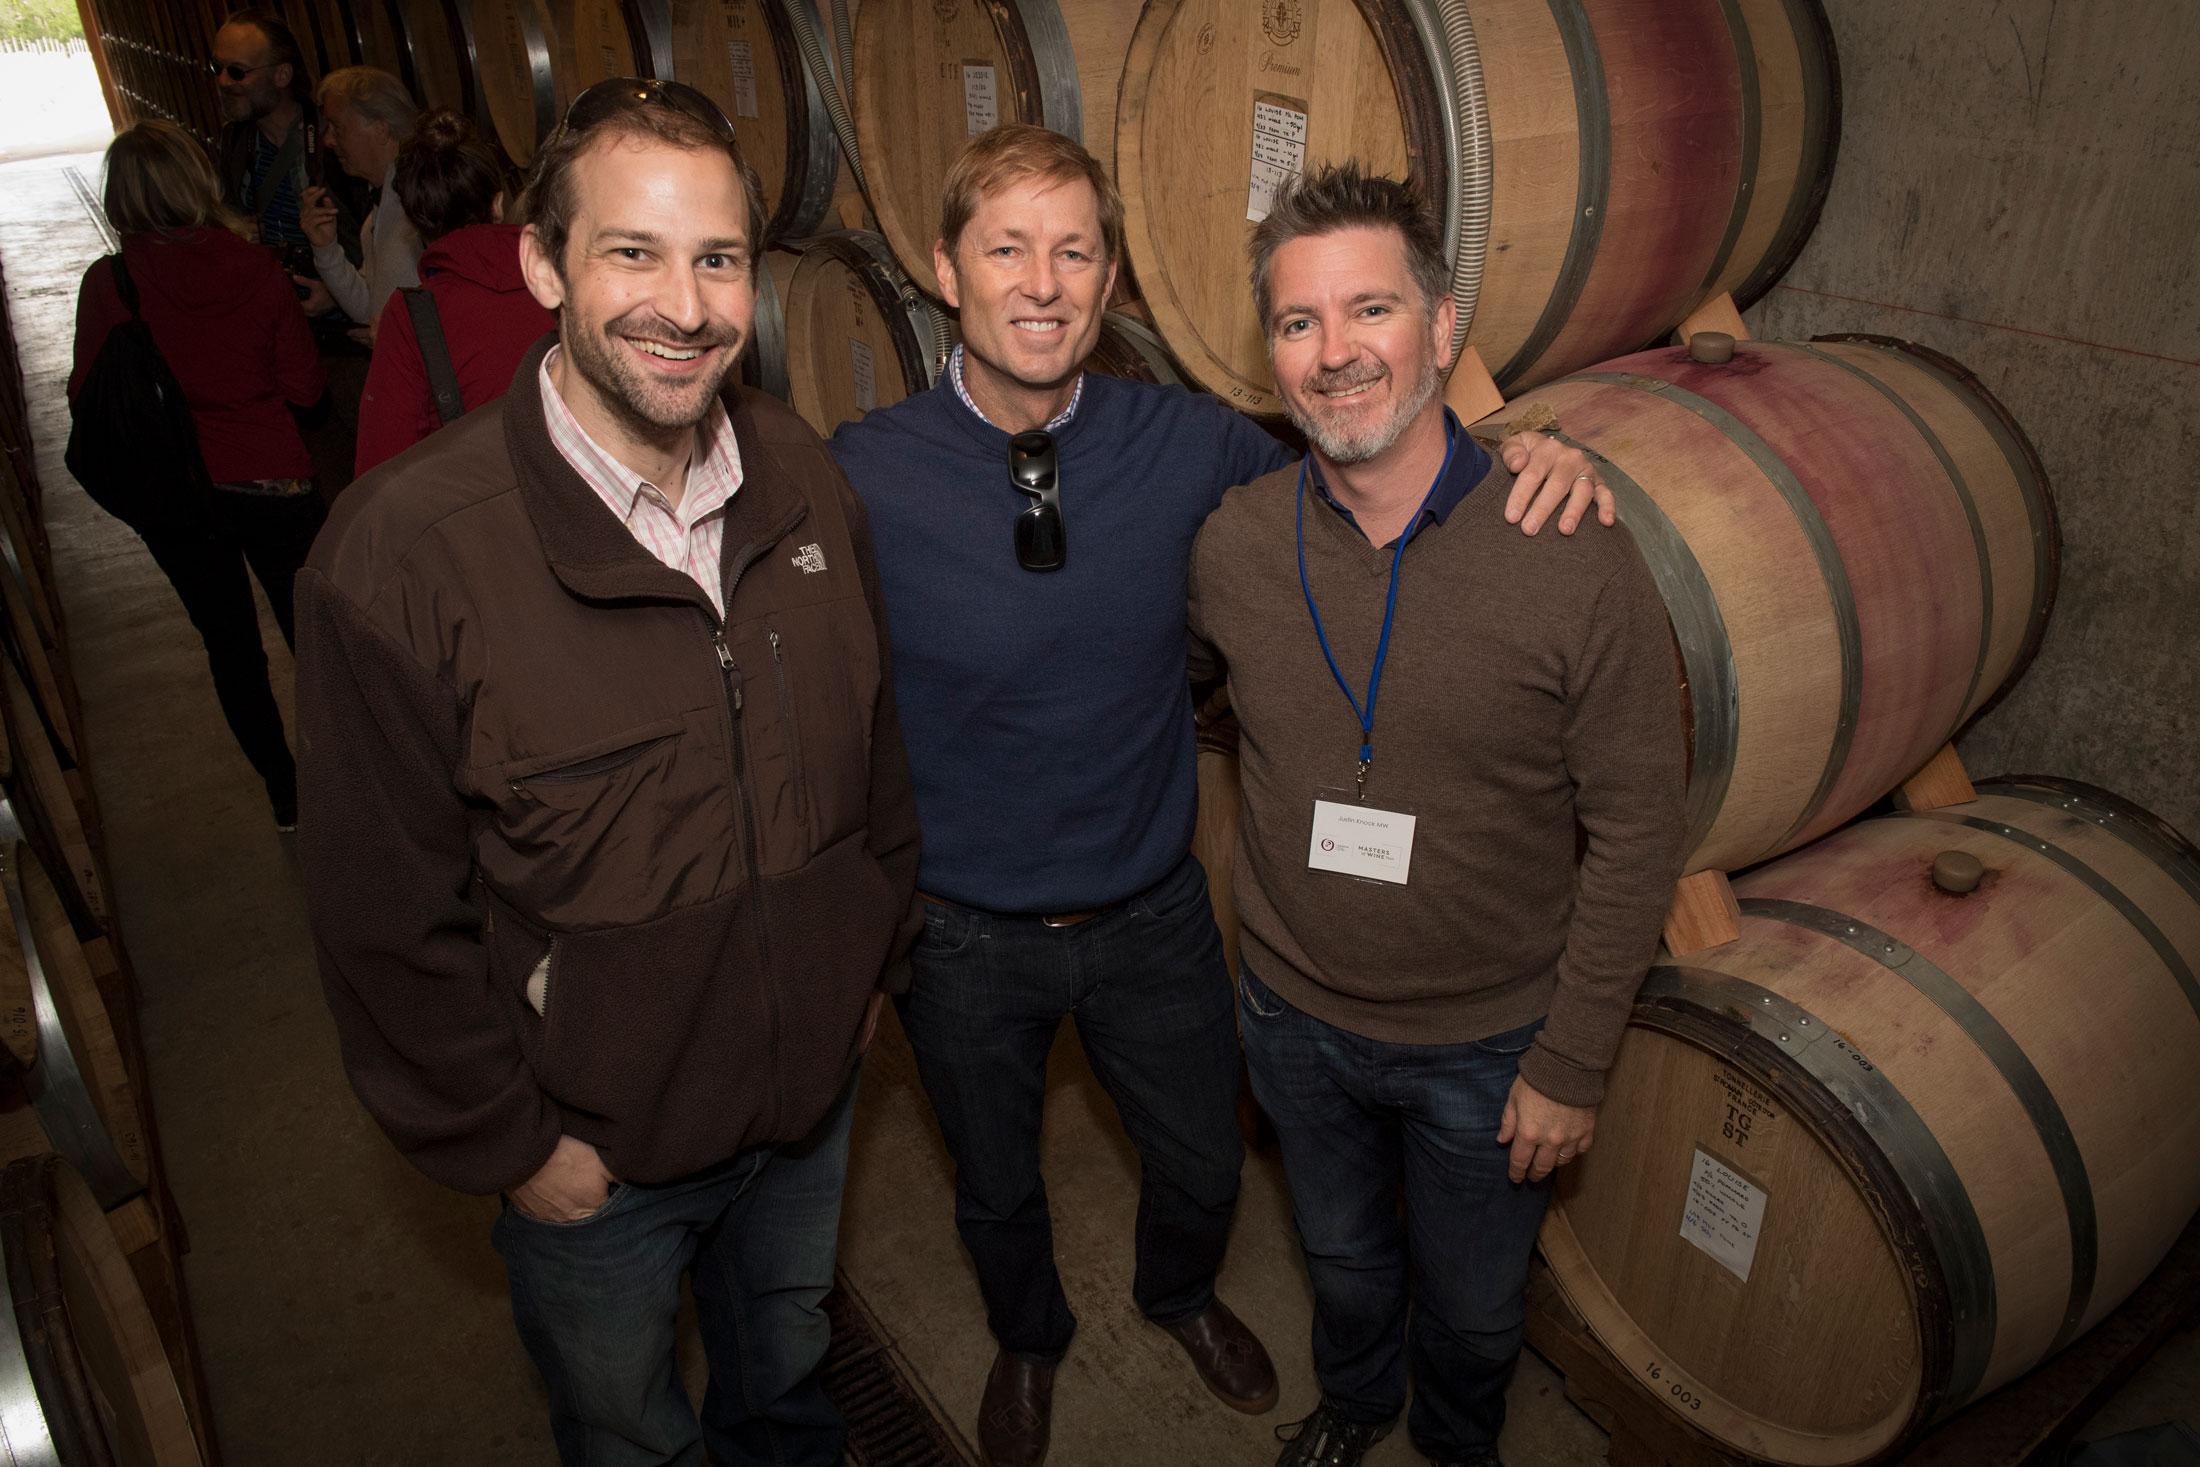 Masters of Wine at Cristom Vineyards